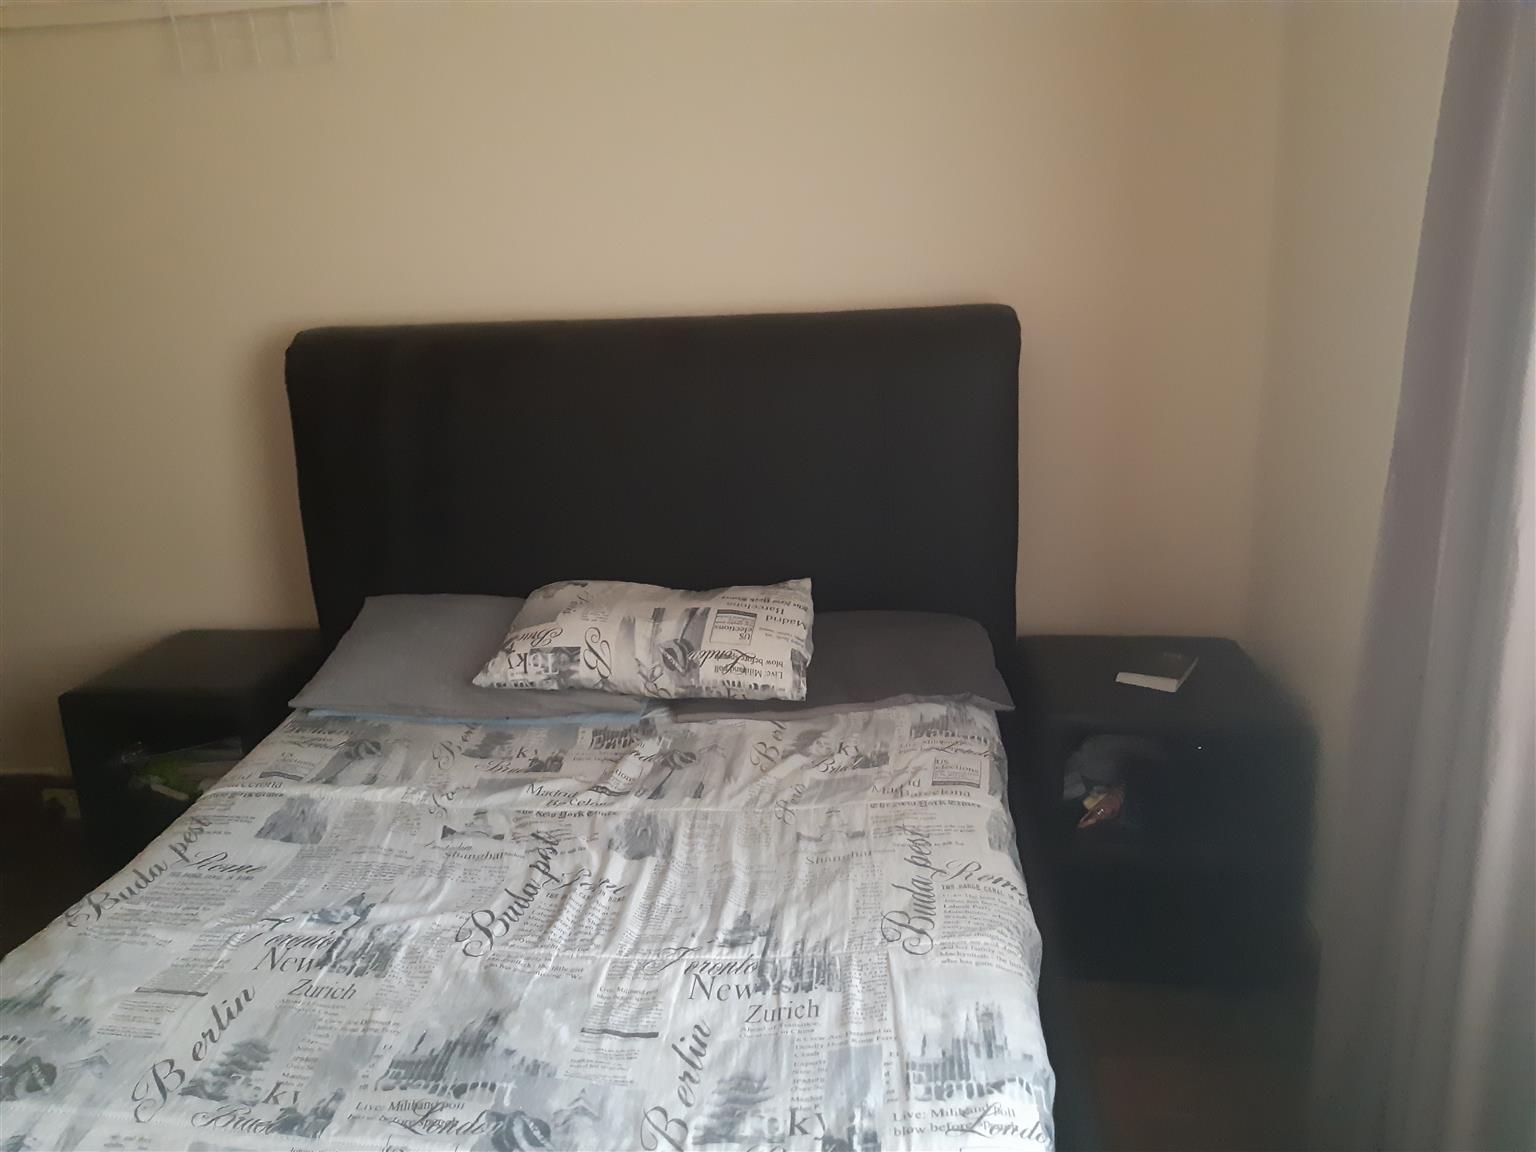 Box sleigh bed